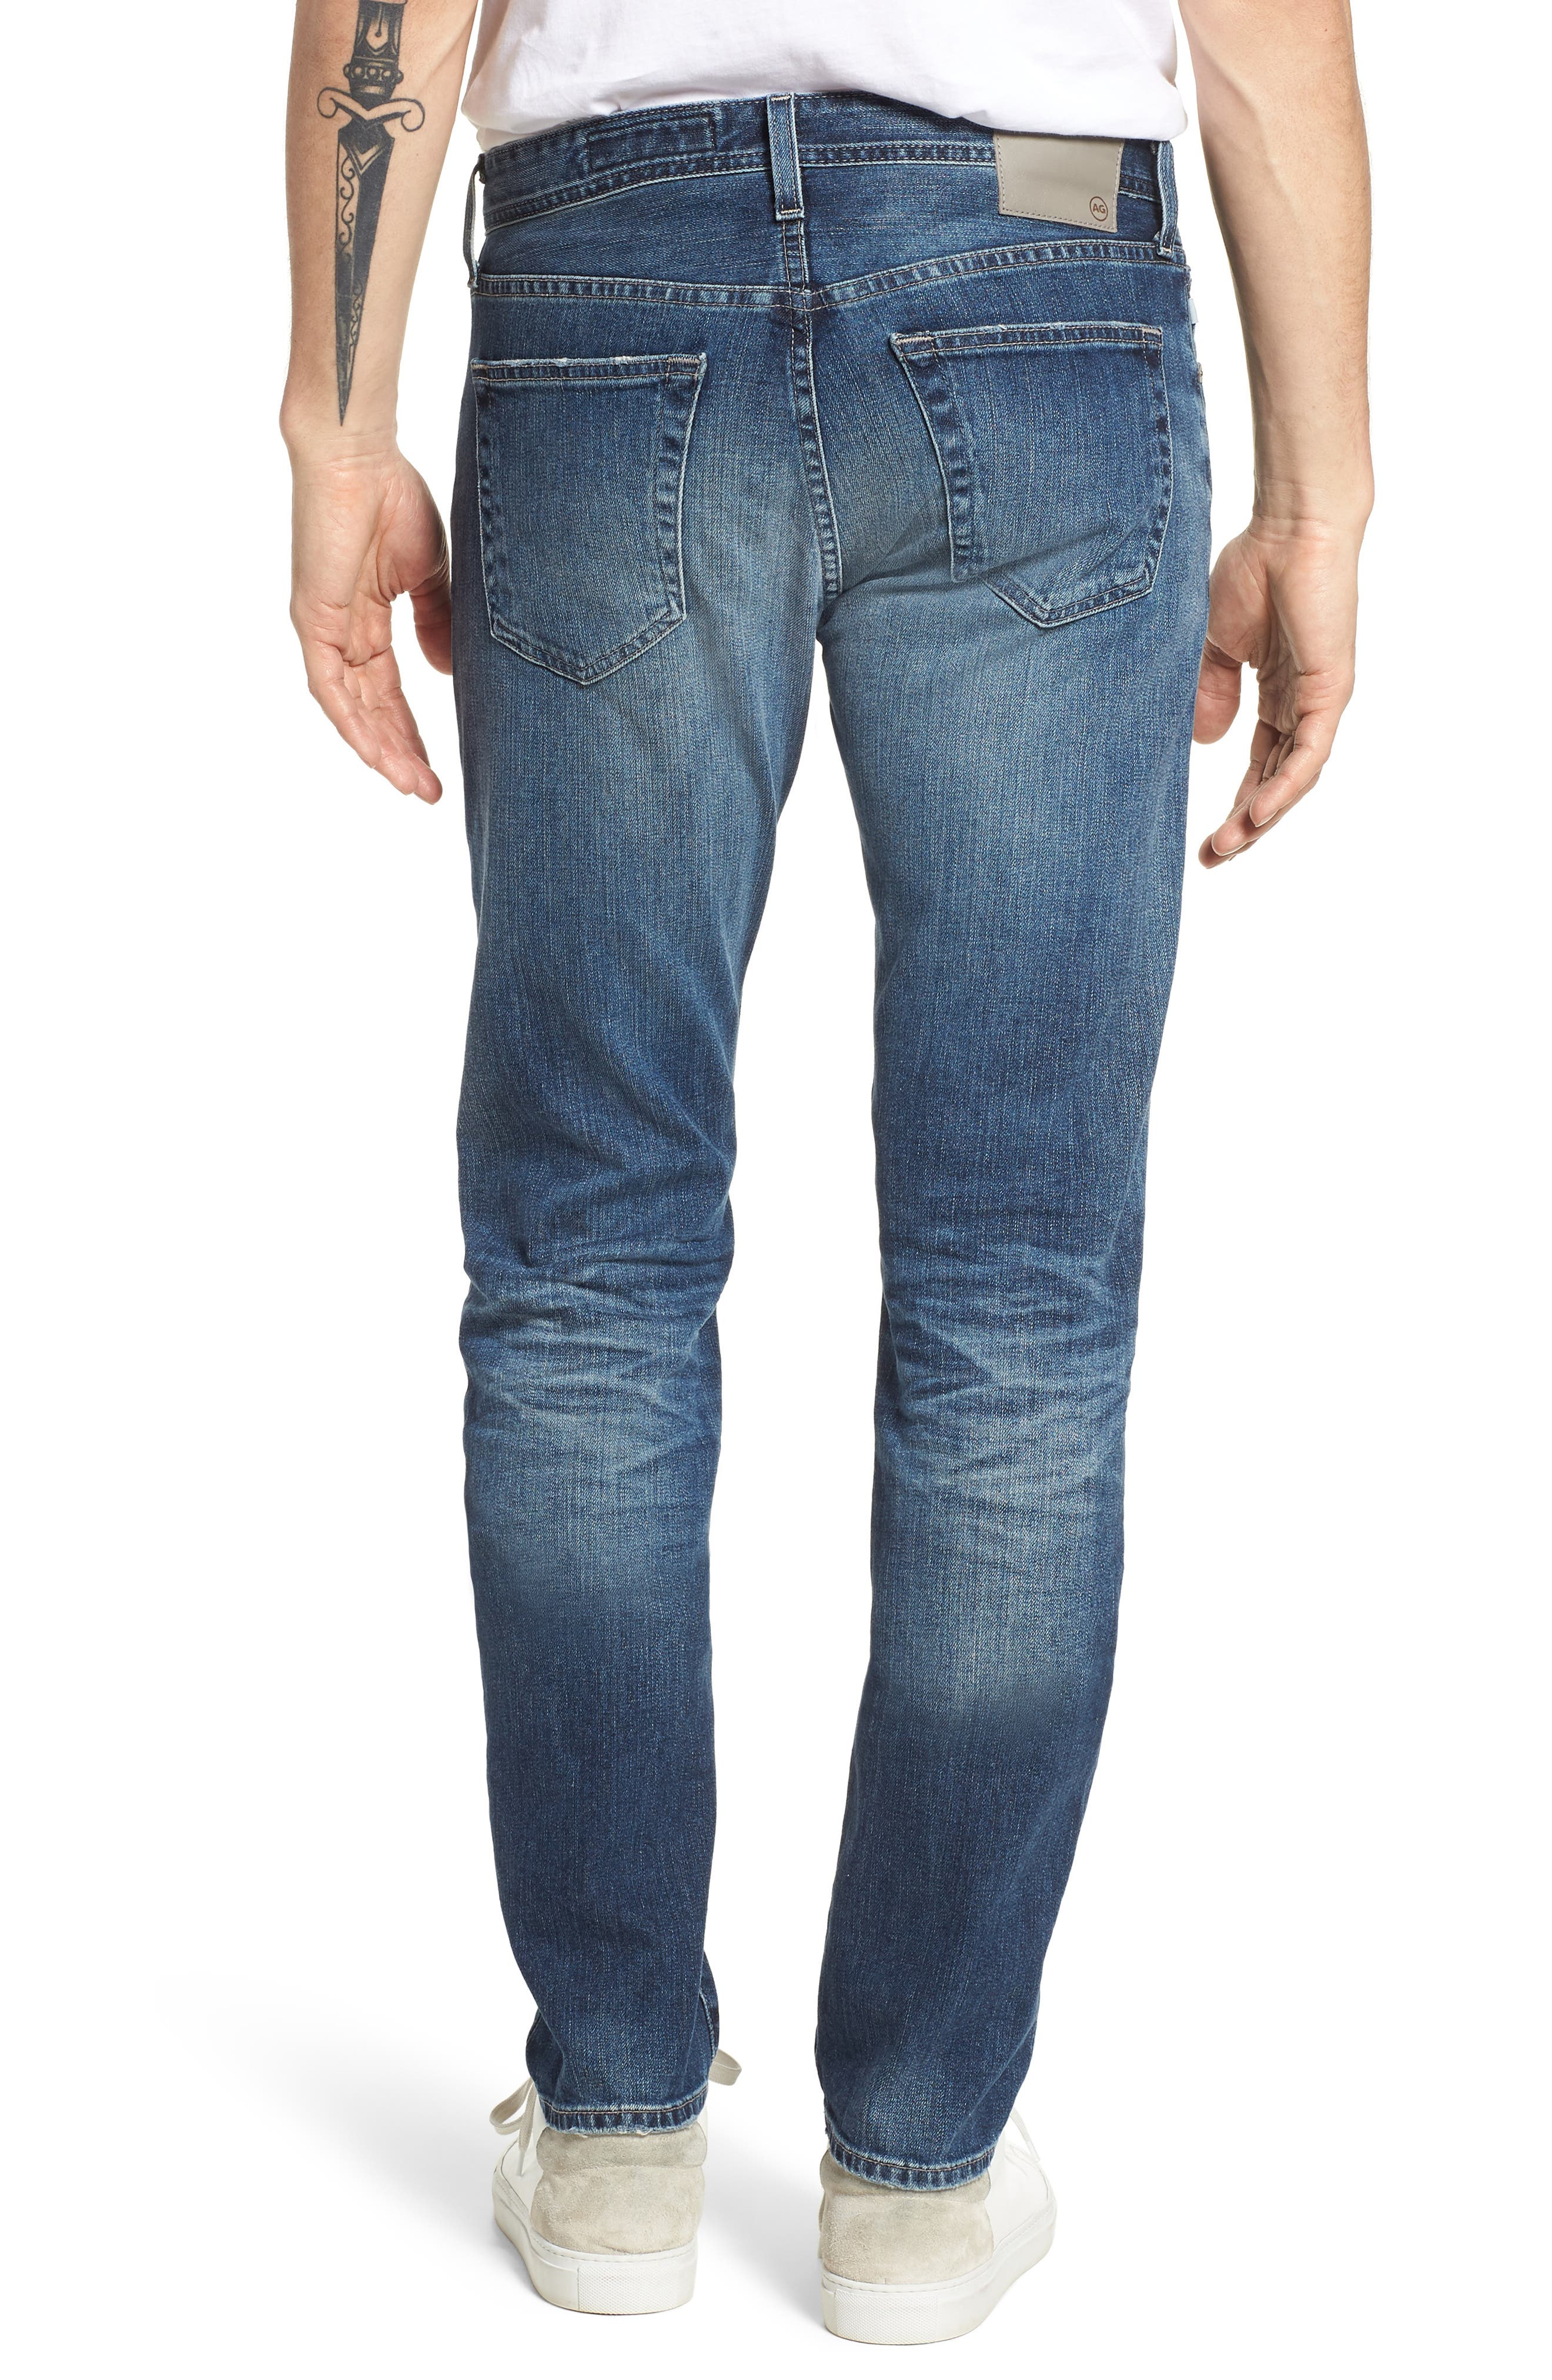 Tellis Slim Fit Jeans,                             Alternate thumbnail 2, color,                             12 Years Mavericks